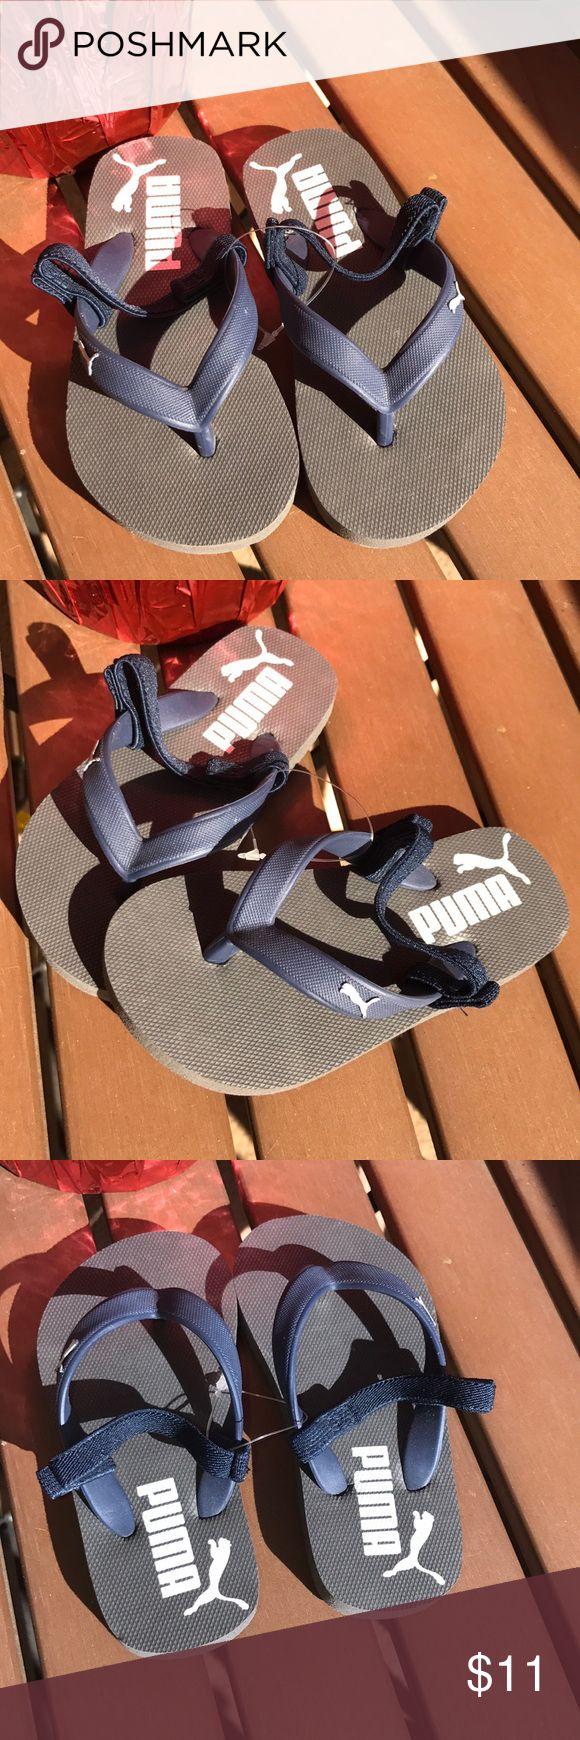 New Puma toddler flip flops sandals New Puma toddler flip flops. Size 8c with elastic heel strip. Dark blue. Soft foot beds. Puma Shoes Sandals & Flip Flops